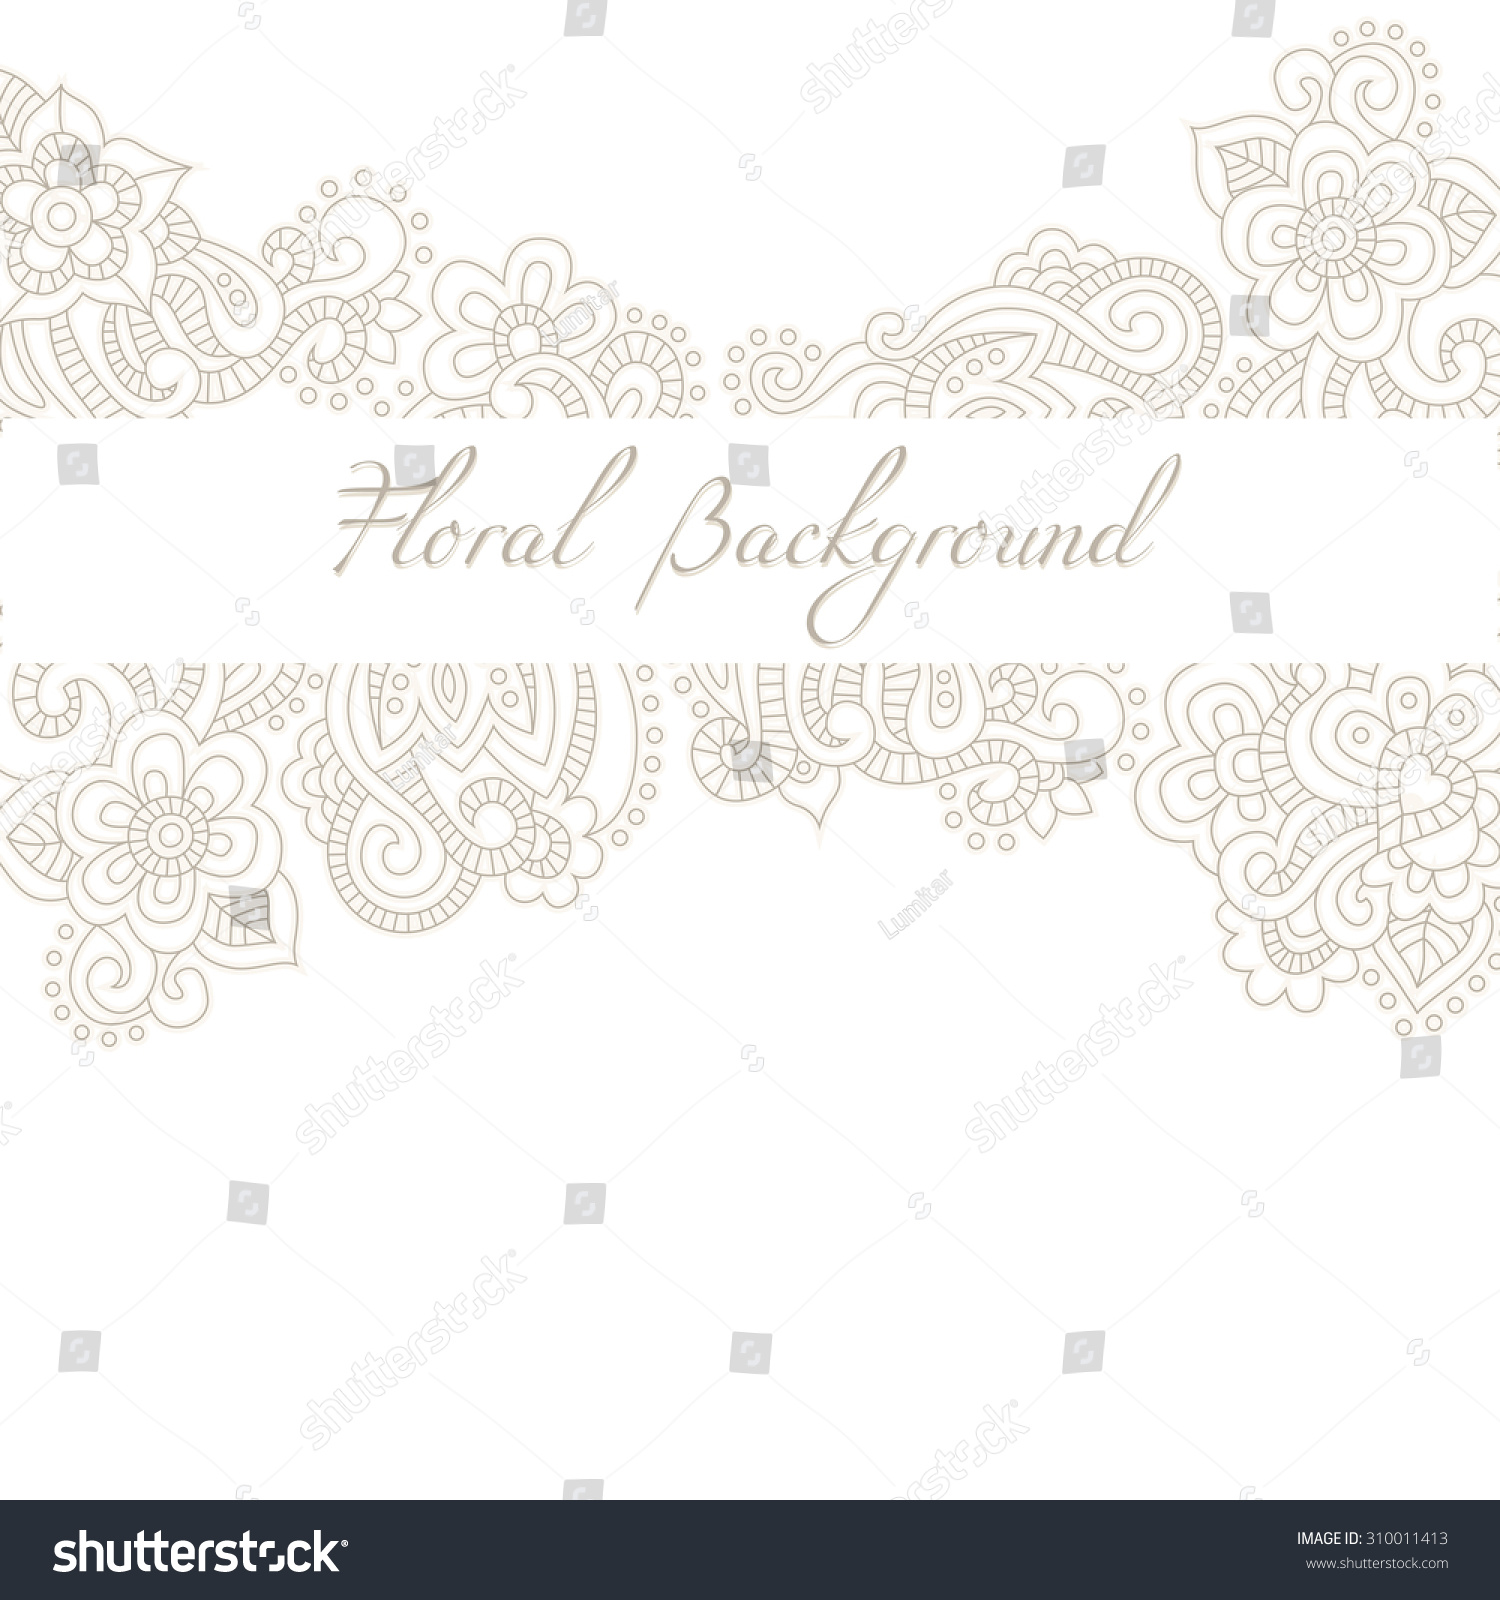 Wedding invitation anniversary card template romantic stock vector wedding invitation or anniversary card template with romantic floral background and sample text subtle stopboris Choice Image